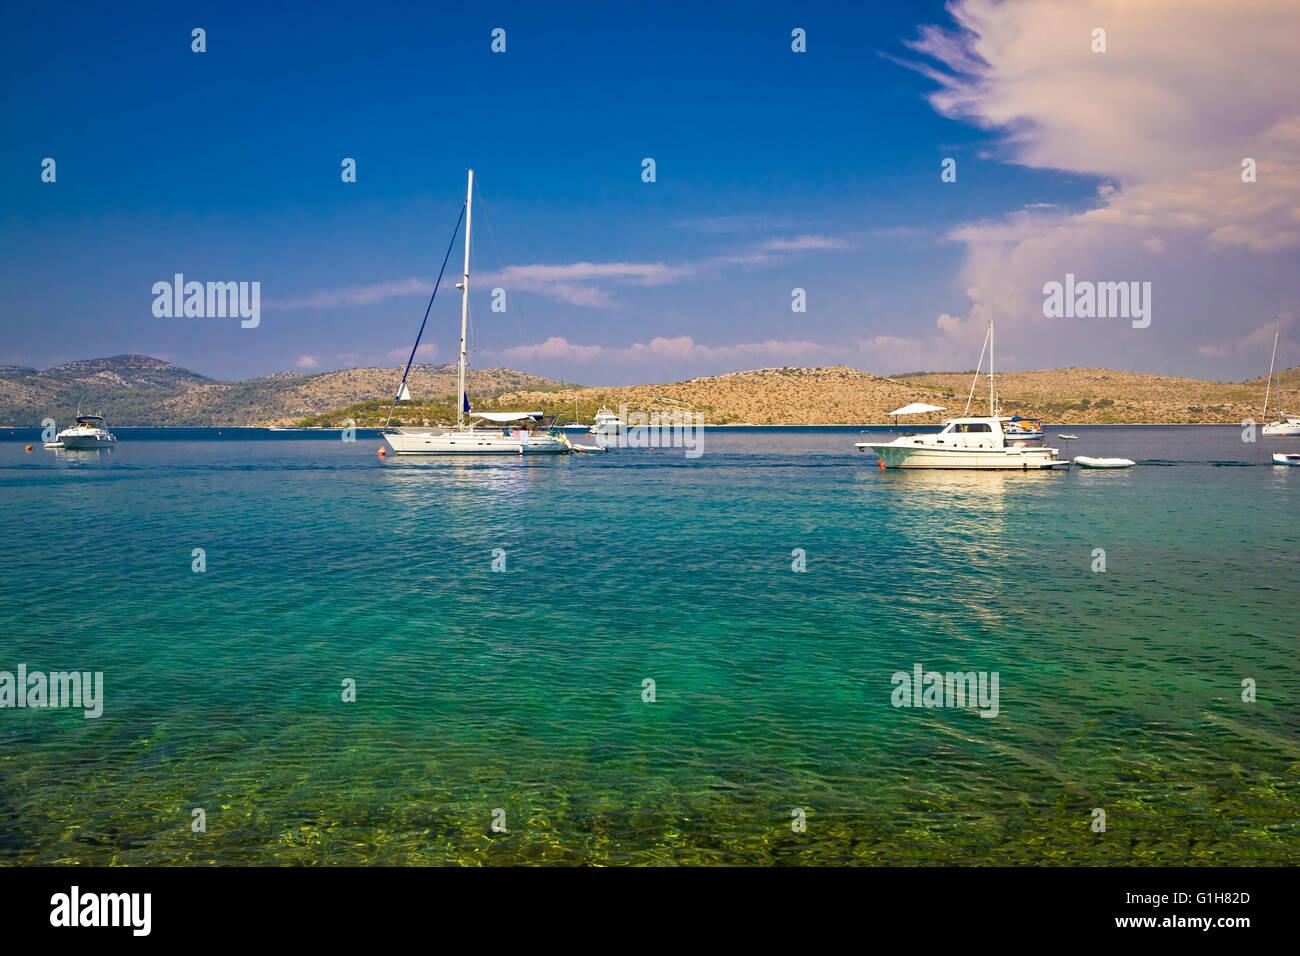 Kornati islands national park yachting view, dalmatia, Croatia - Stock Image